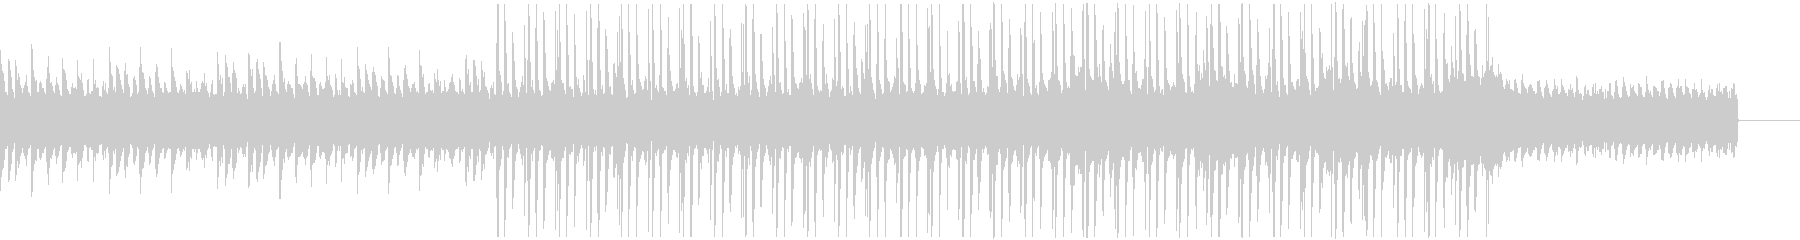 Lo-Fi Pianoの未再生の波形